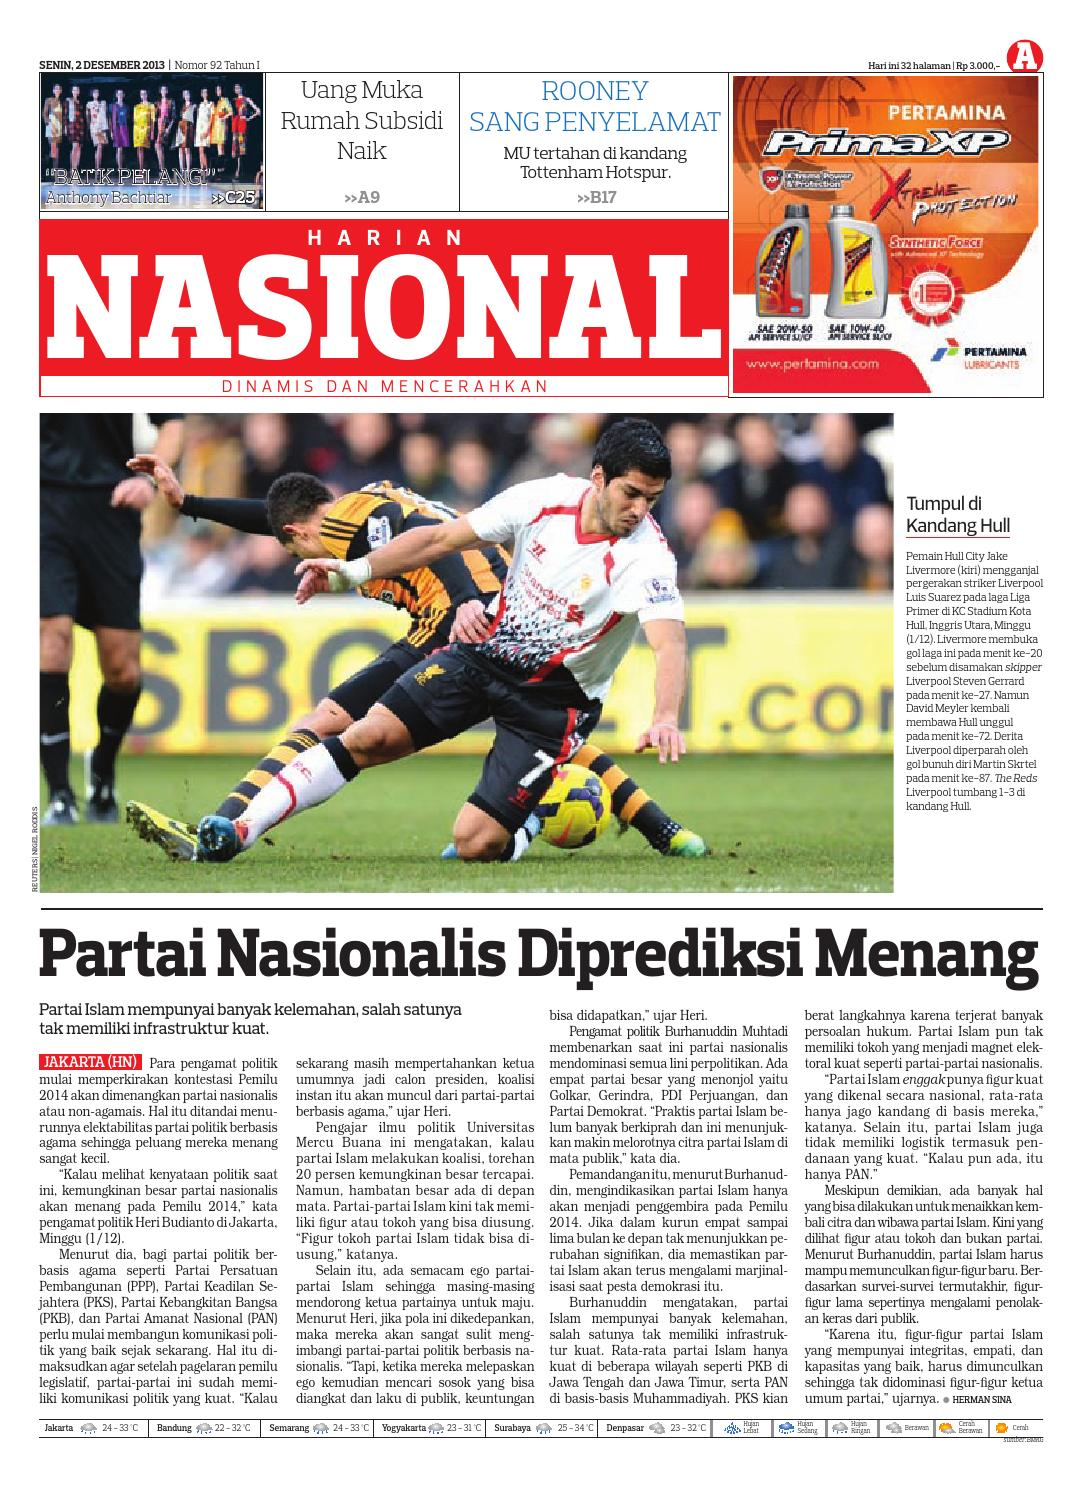 Harian Nasional By Issuu Produk Ukm Bumn Kalung Tenun Wires 12